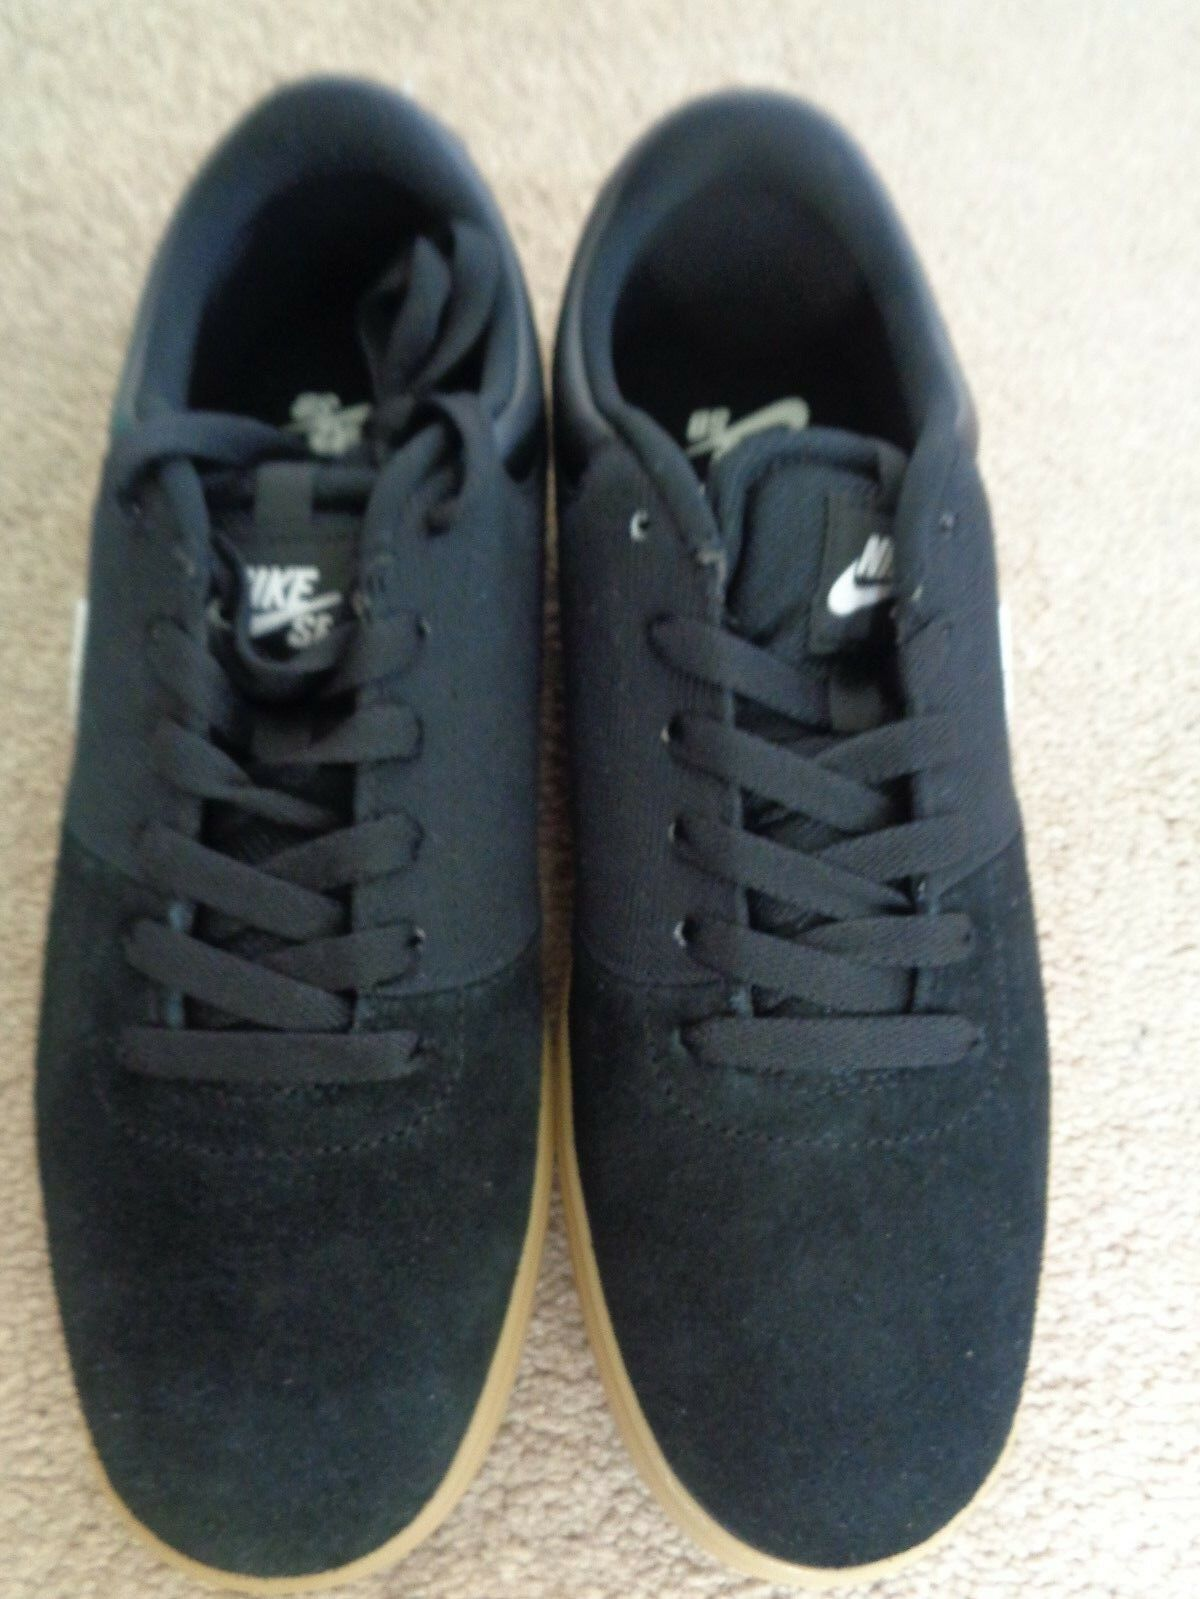 Nike Rabona mens trainers schuhe Turnschuhe 641747 012 us uk 7 eu 41 us 012 8 NEW+BOX 6647bf